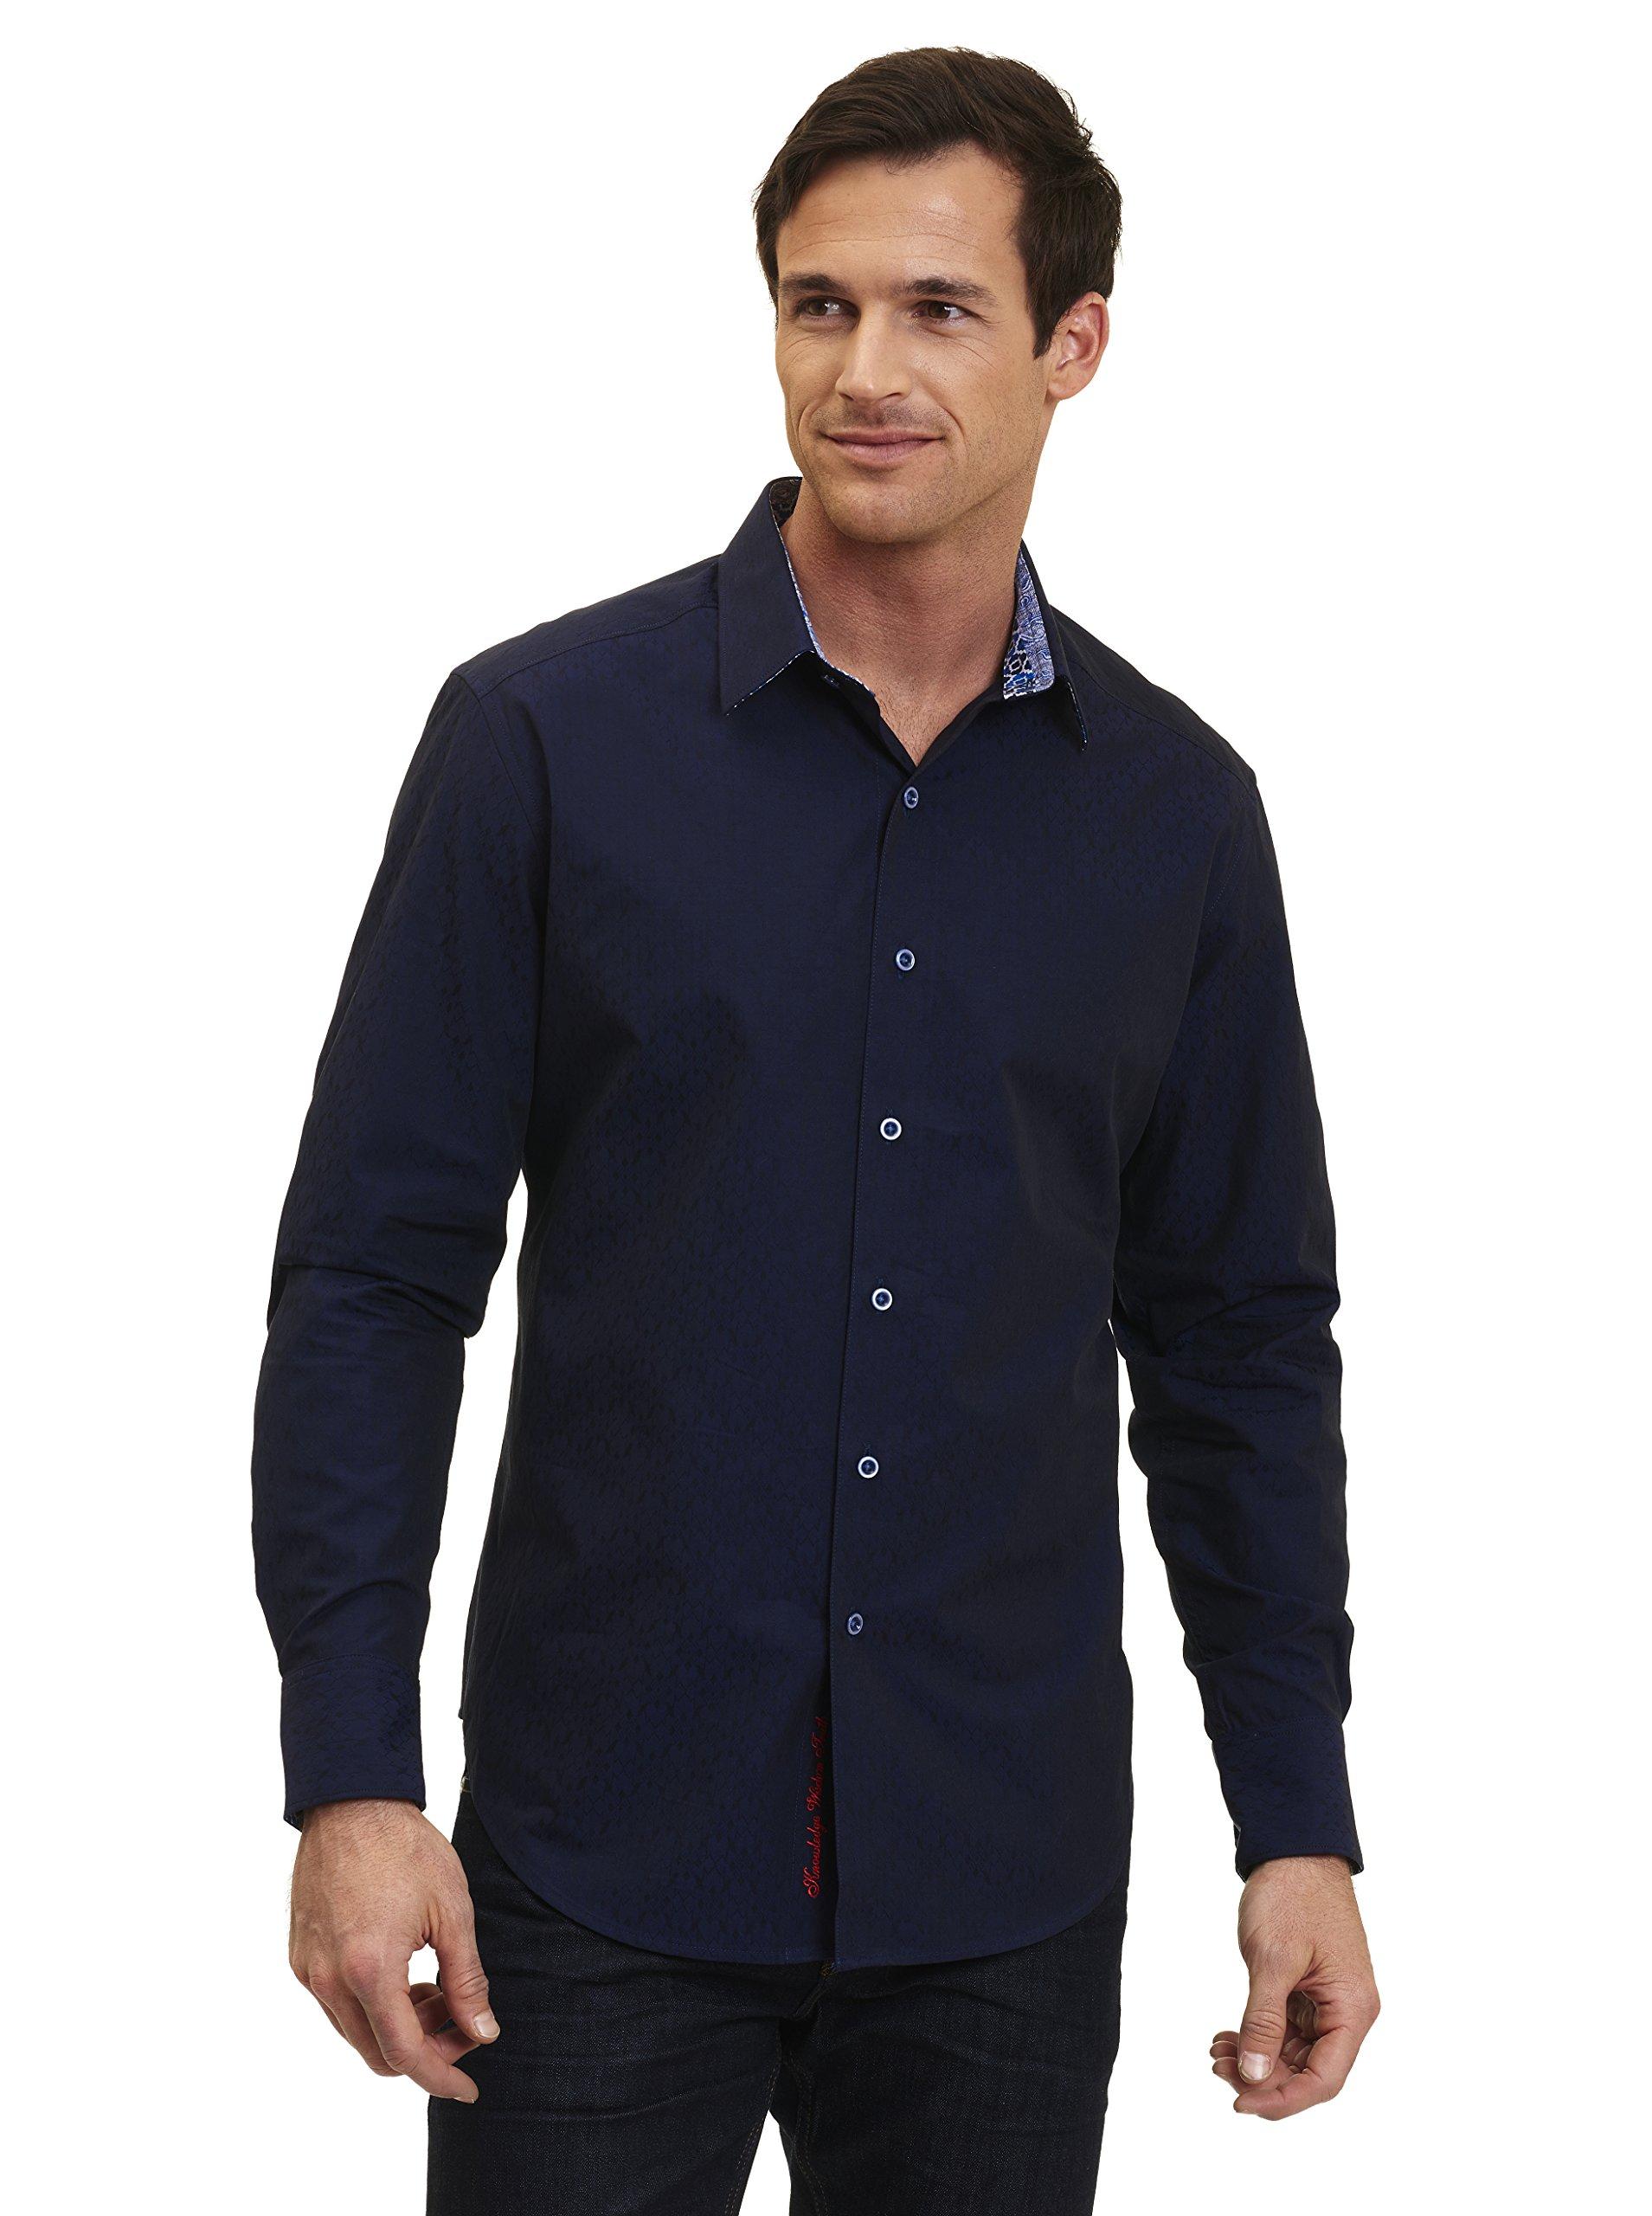 Robert Graham Bayside L/S Woven Shirt Navy Xlarge